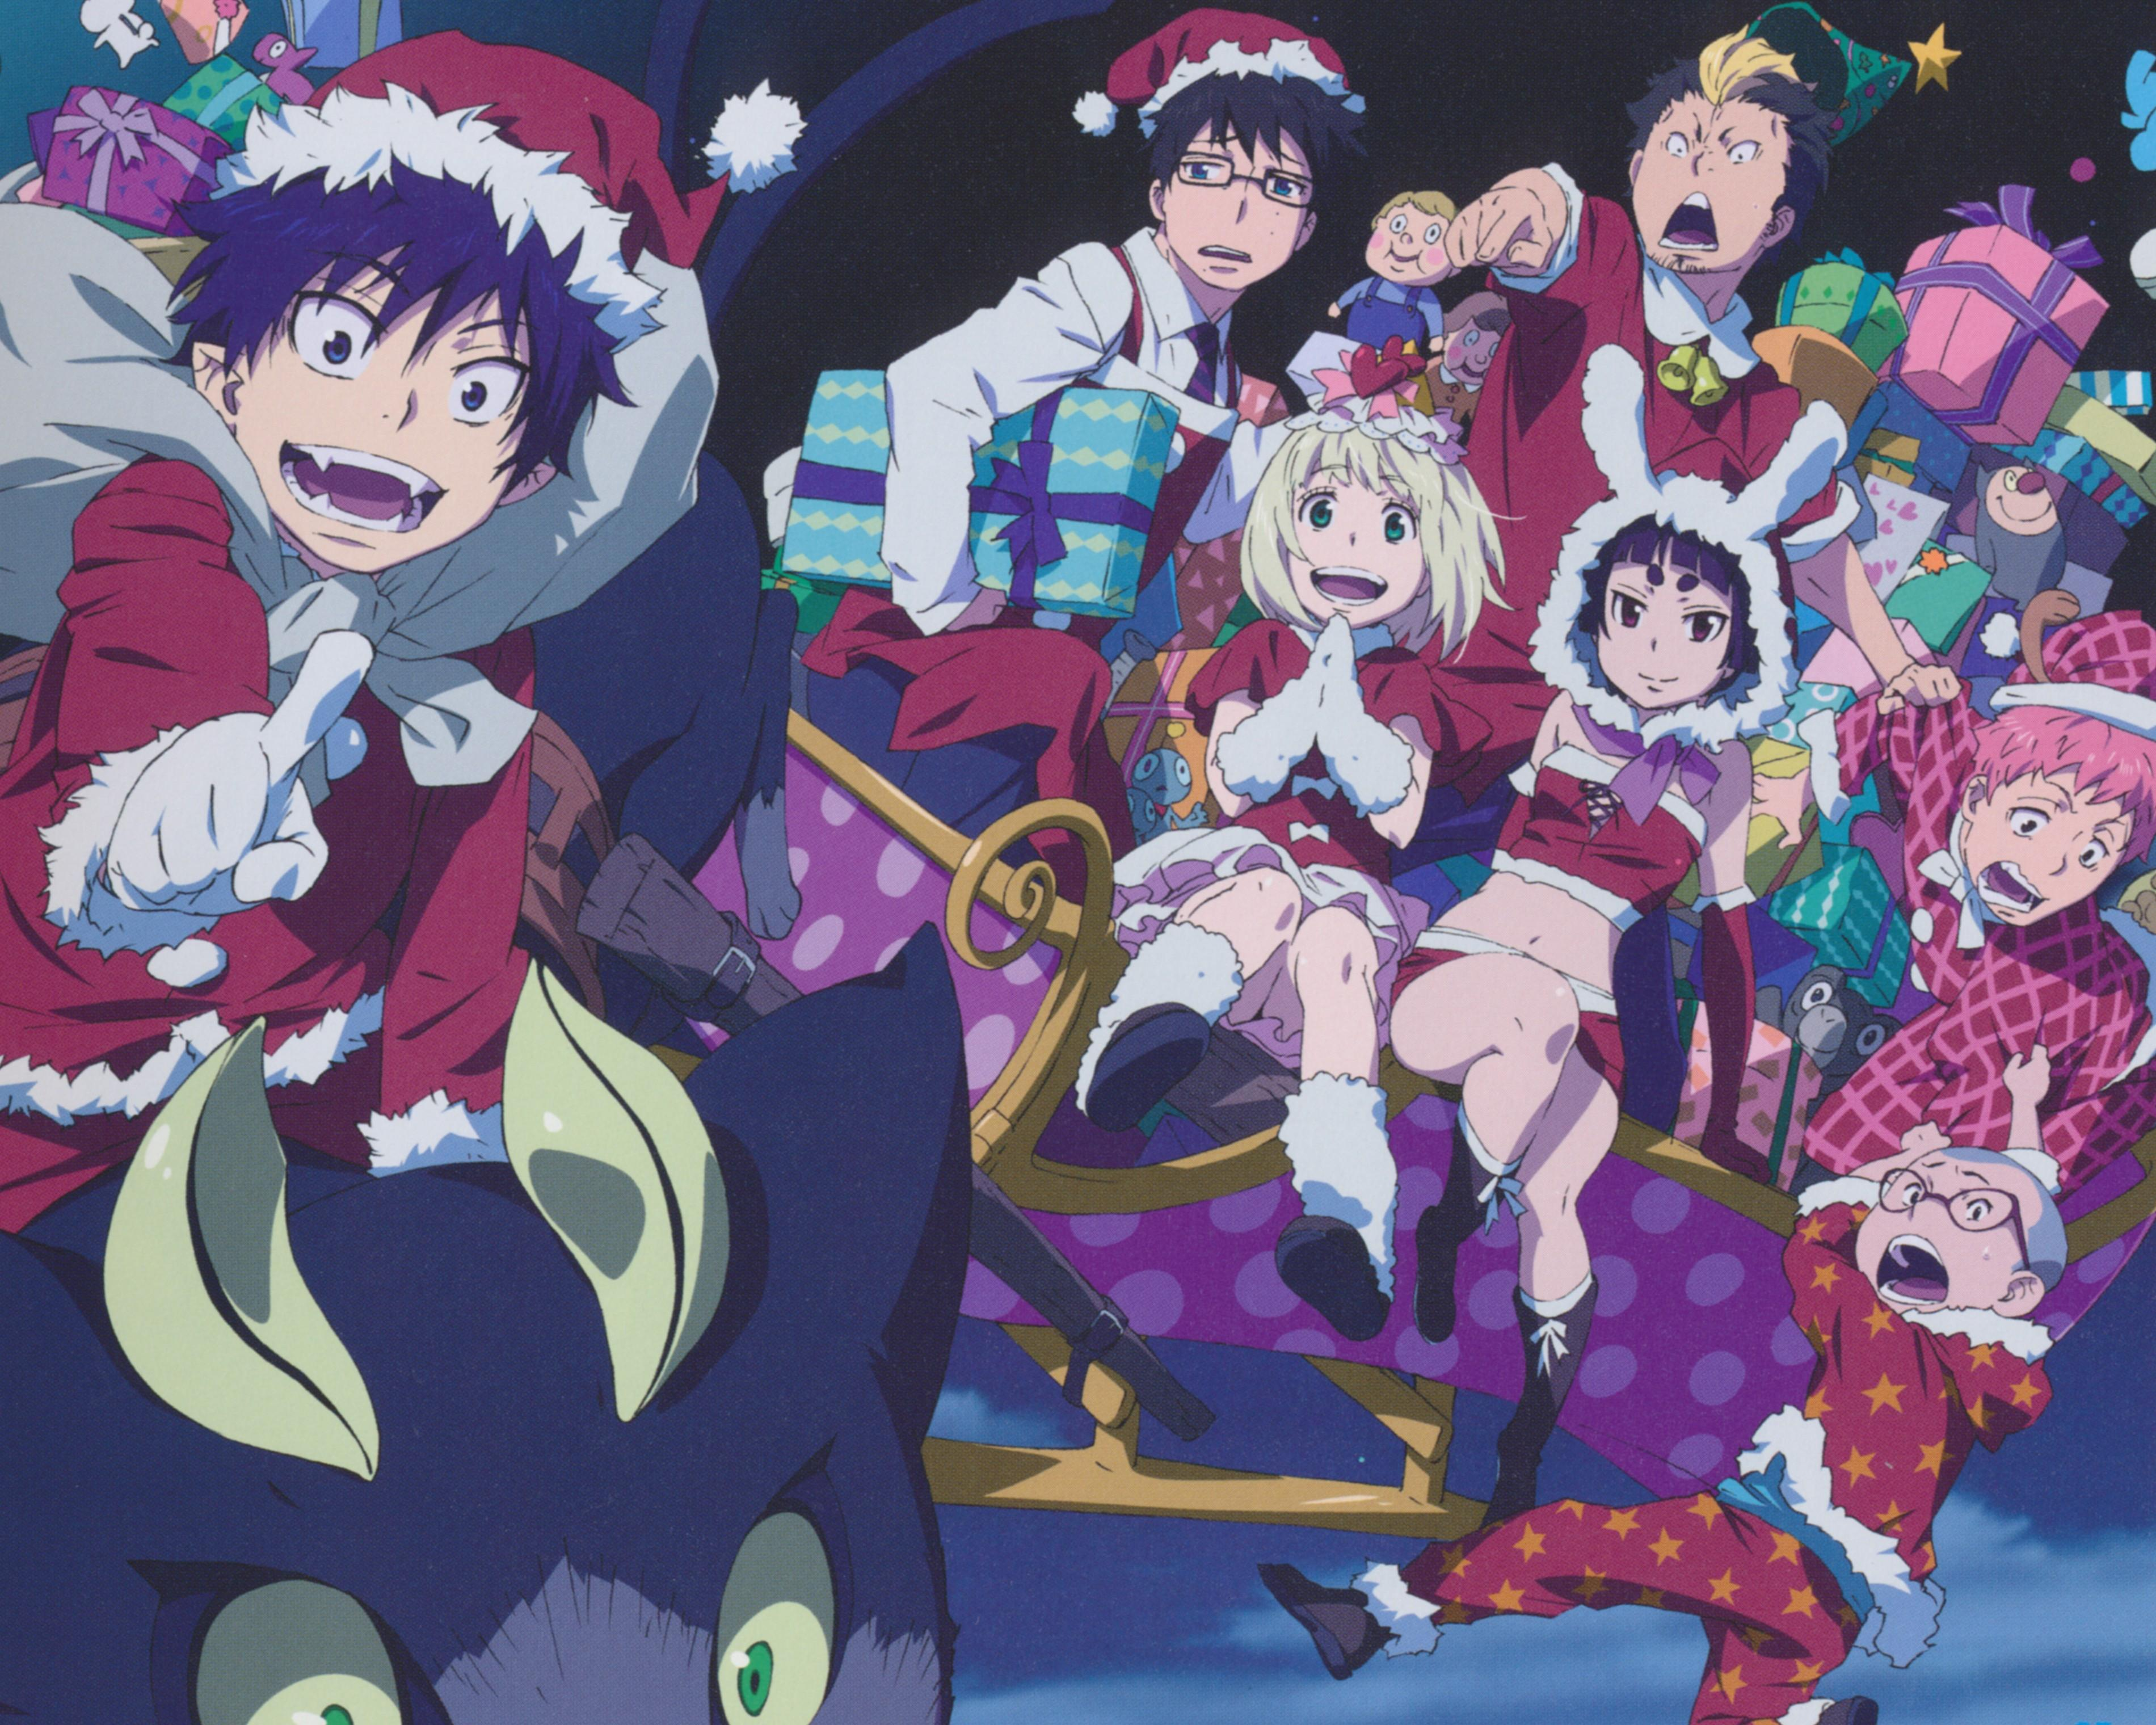 Merry Christmas Anime Wallpapers Wallpaper Cave 14 christmas anime wallpaper